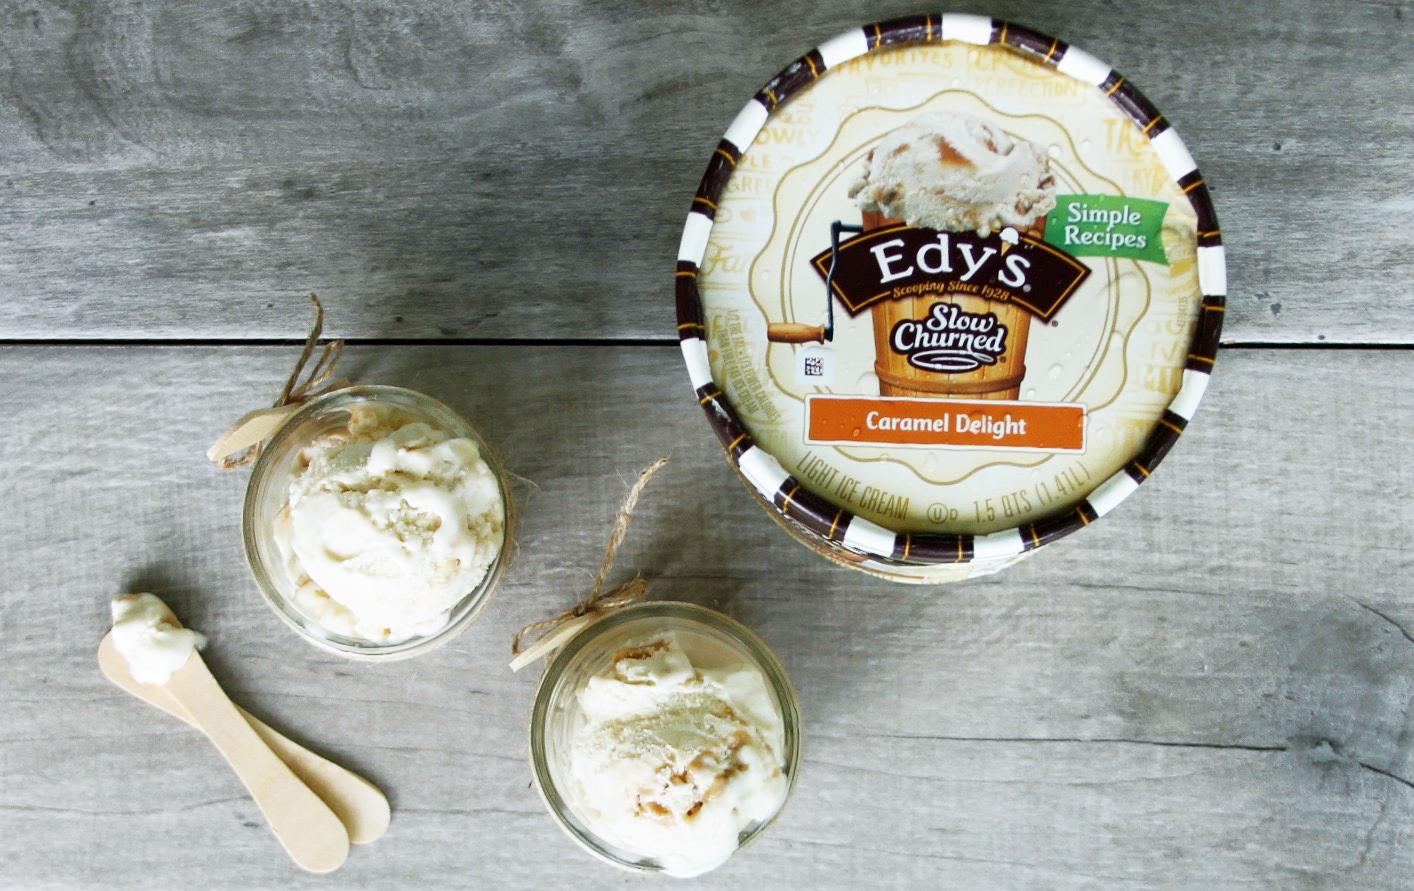 Edy's ice cream served in mason jars